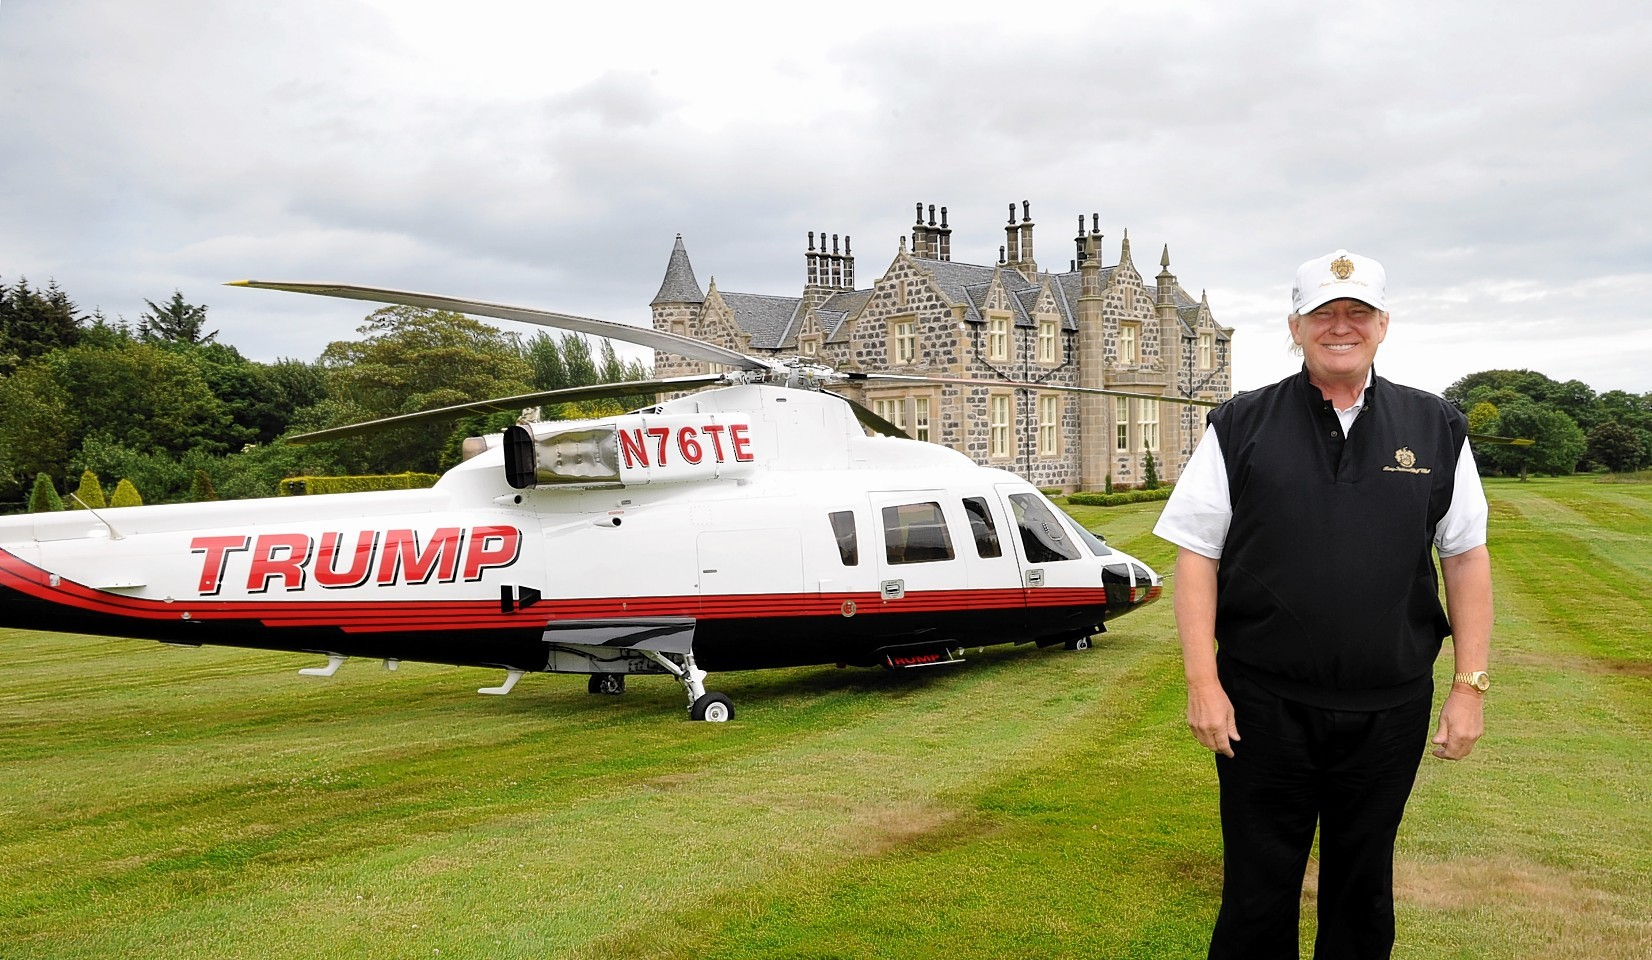 Donald Trump at the Menie Estate last year